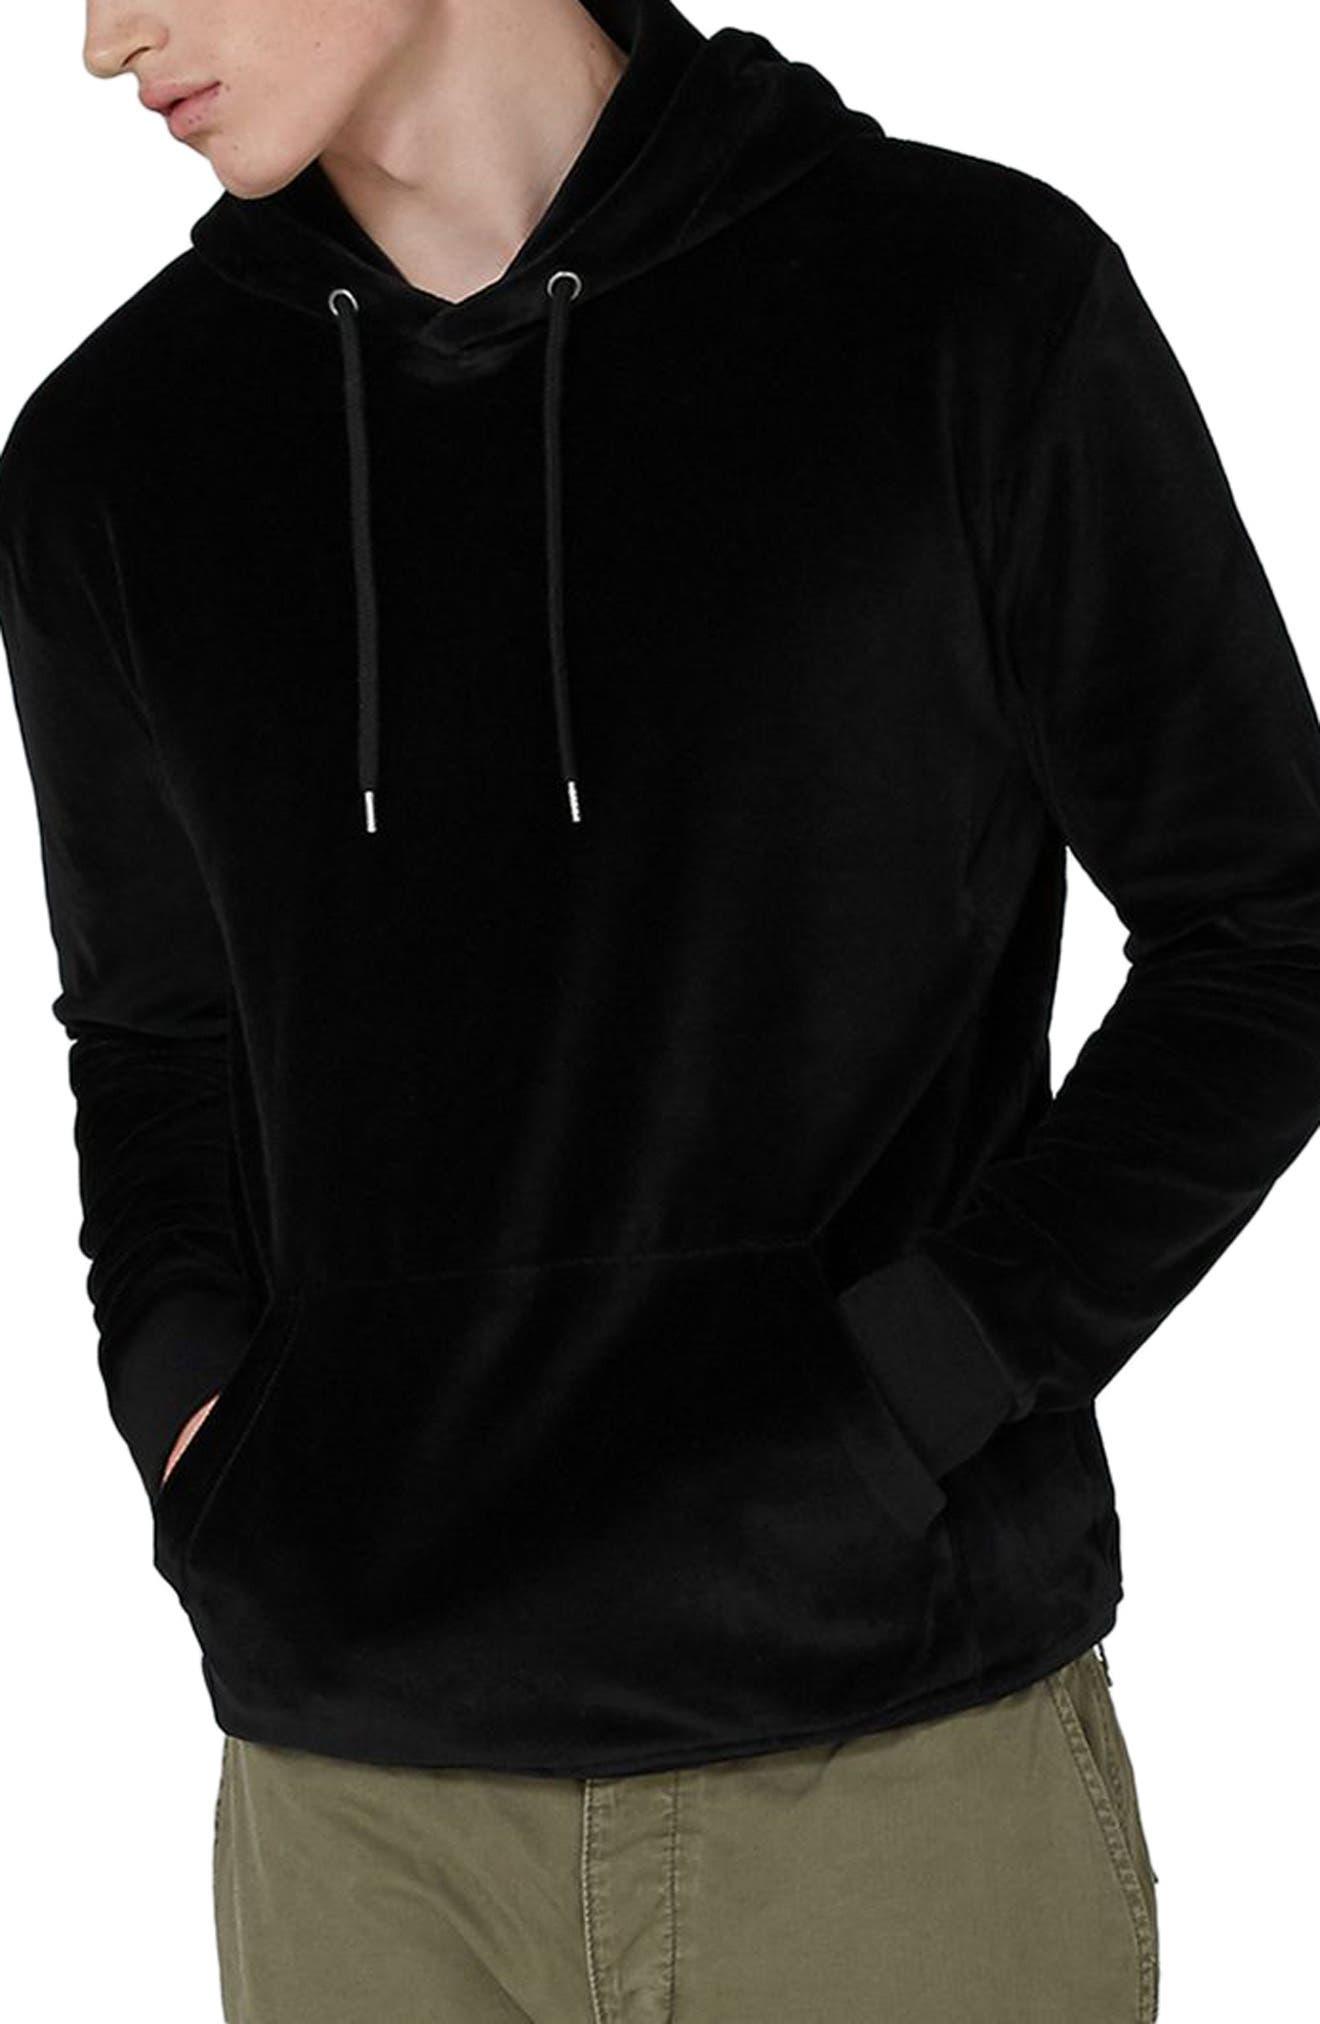 New Markdowns   Men's Sweatshirts & Hoodies Clothing, Shoes ...